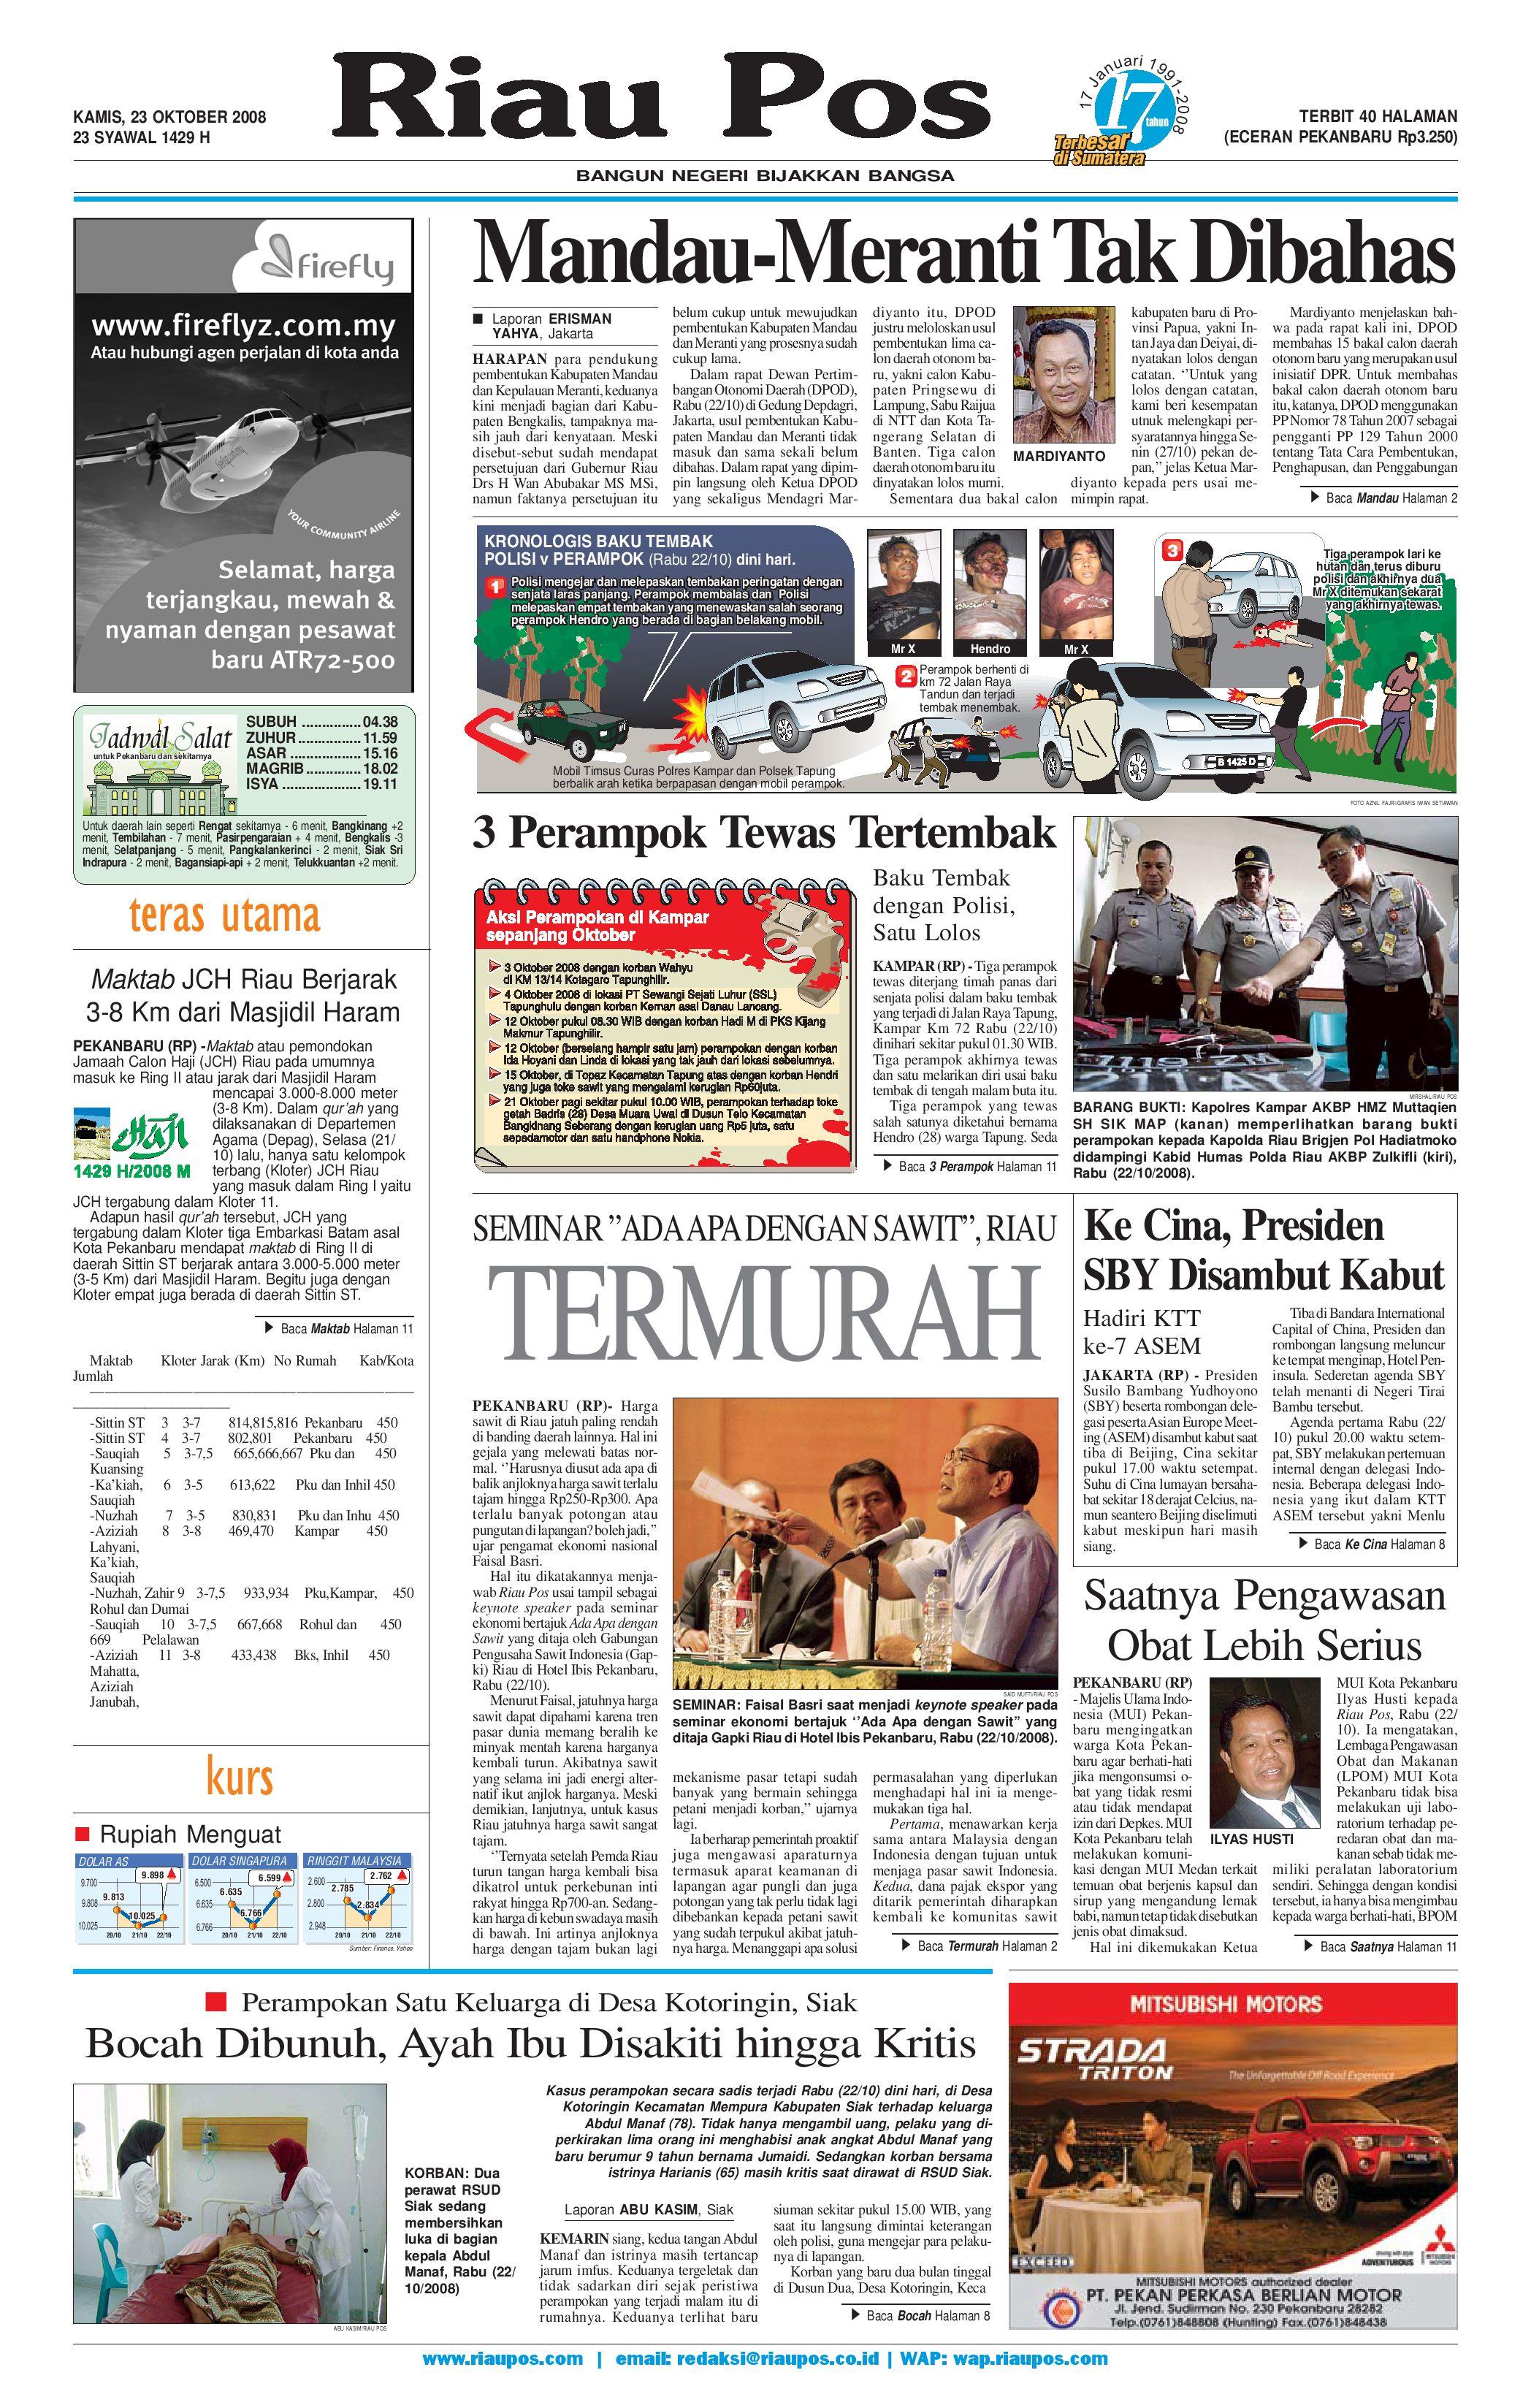 Global News Edisi 33 By Redaksi Gnews Issuu Produk Ukm Bumn Jamu Instan Abah Aromahtrenggalek Ripos